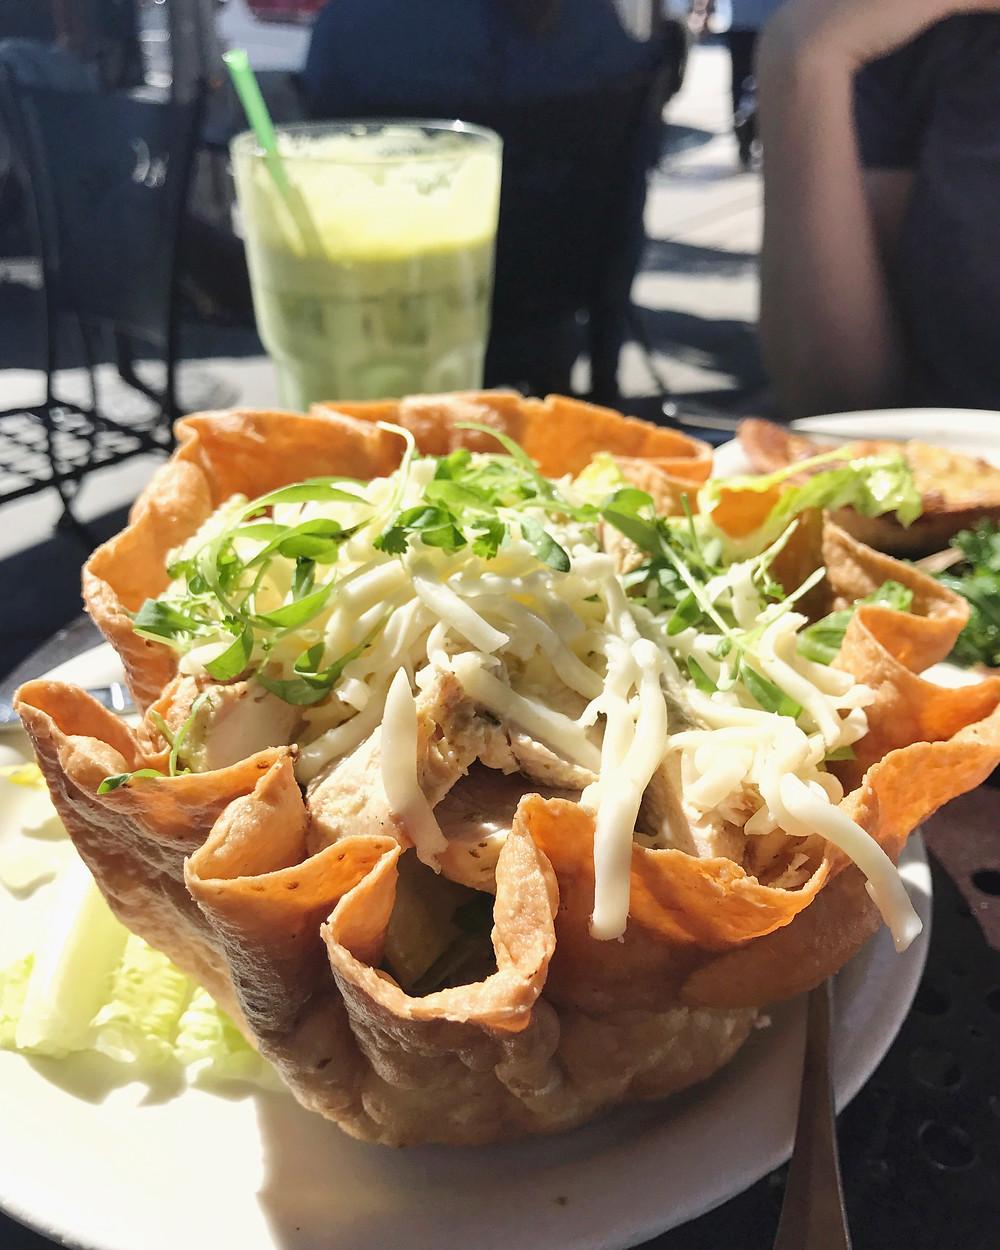 The Tostada Salad - Urth Caffe